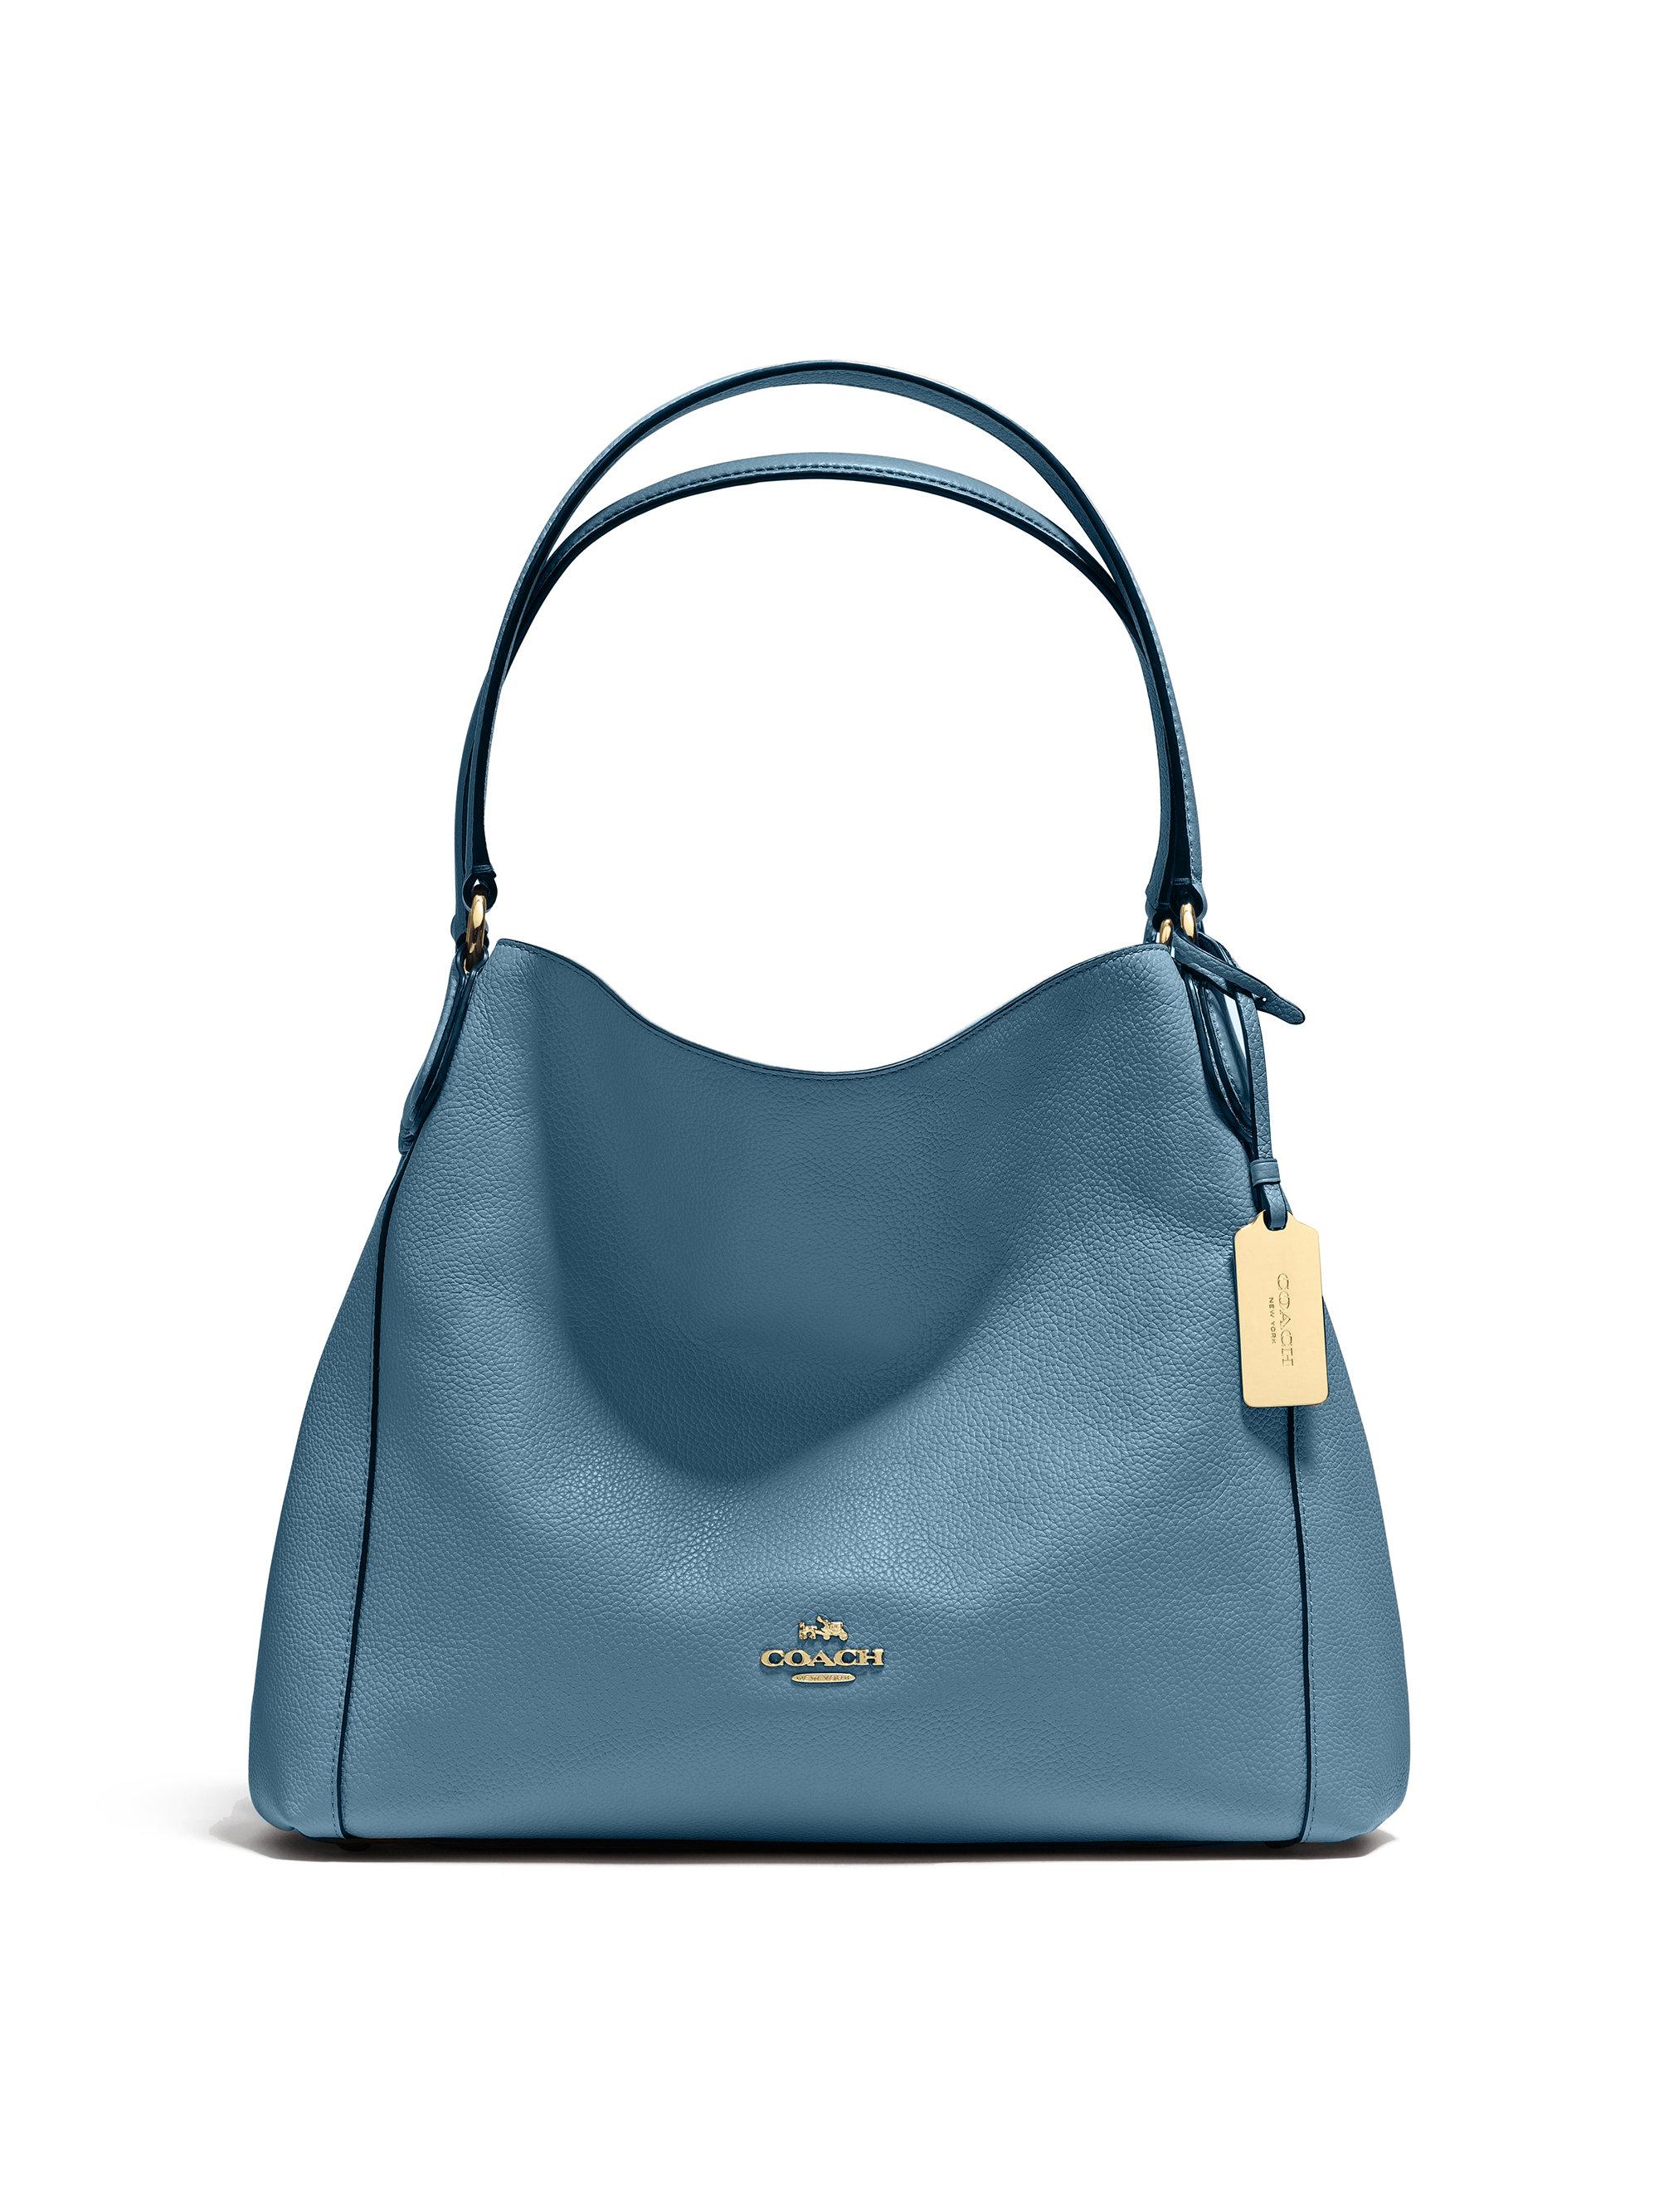 Coach Edie Pebbled Leather Shoulder Bag in Blue | Lyst